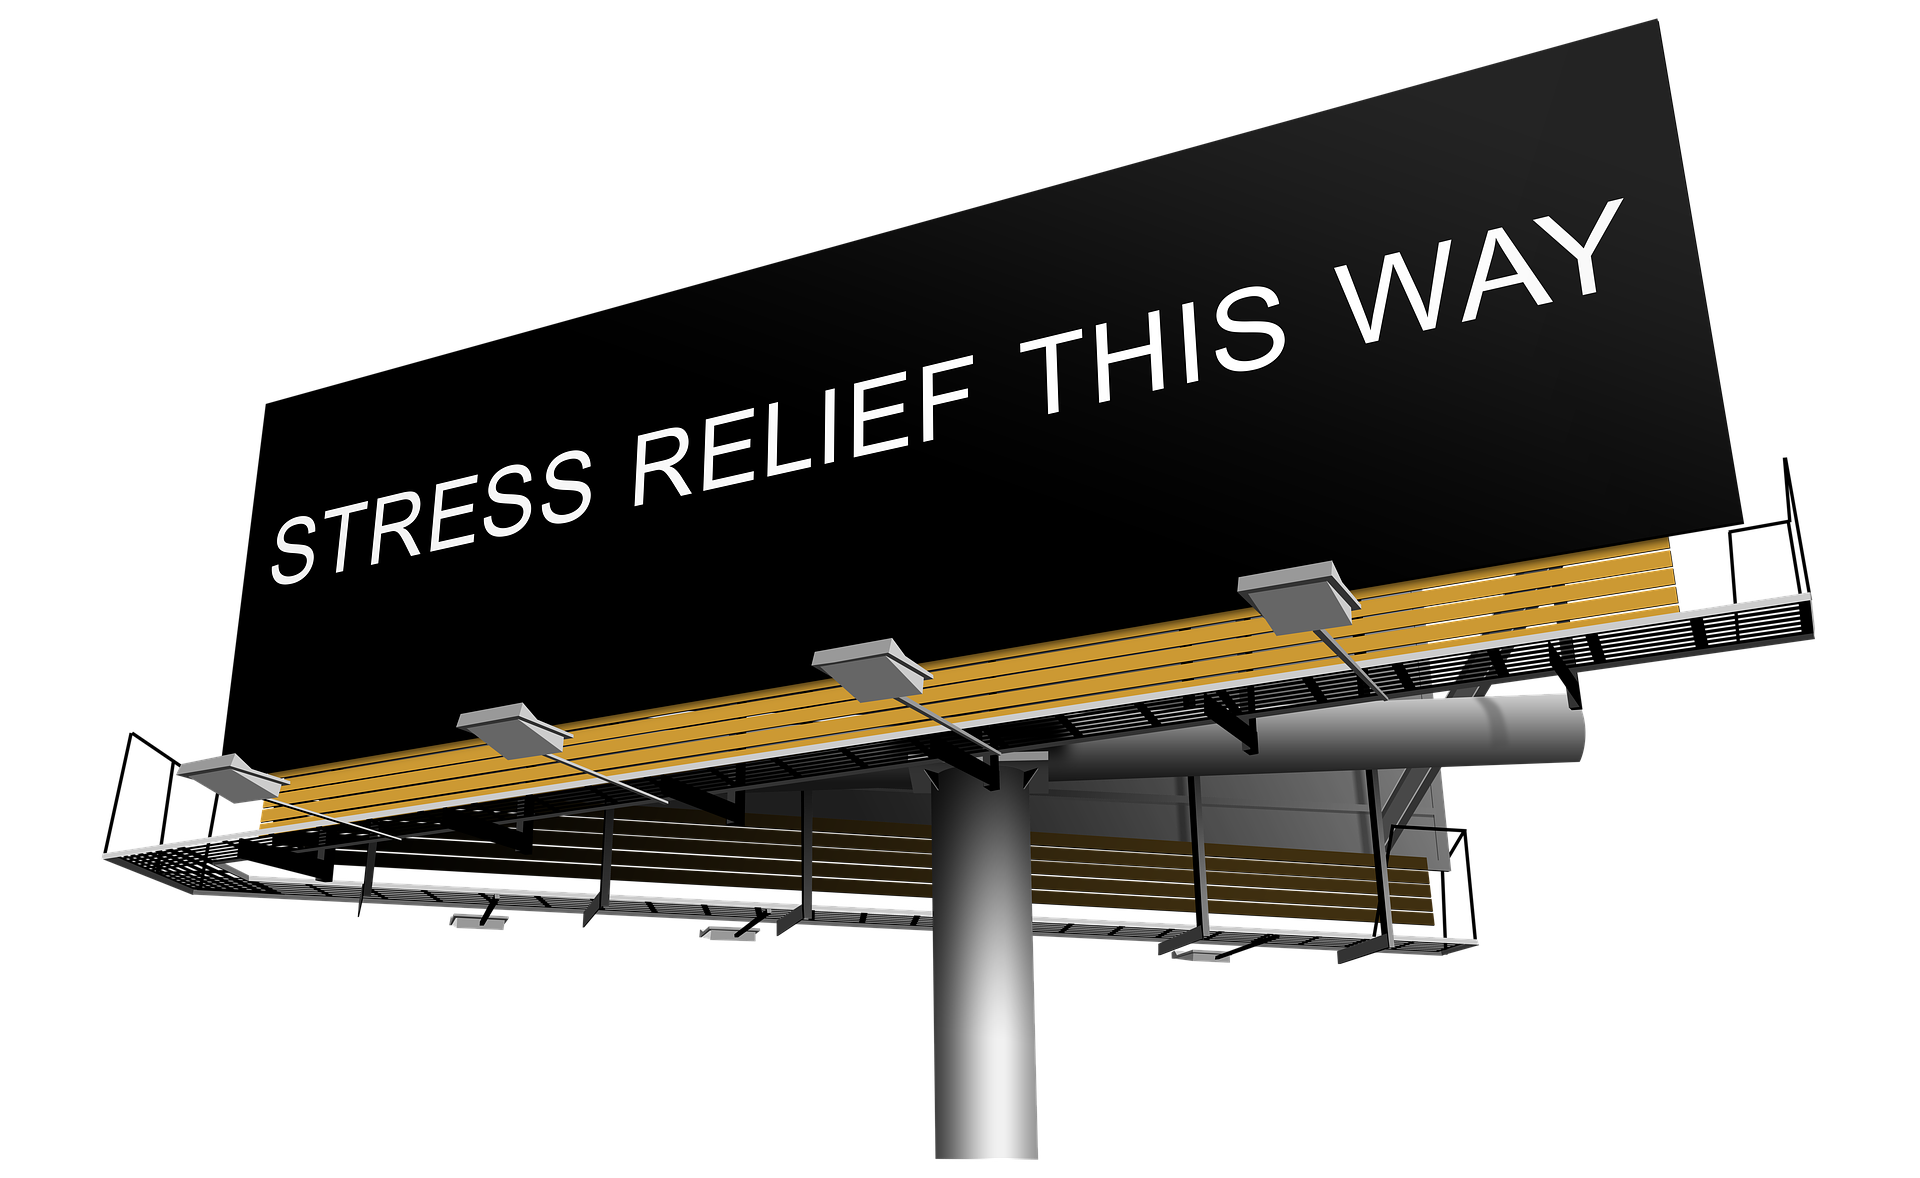 Billboard:Relief Stress This Way